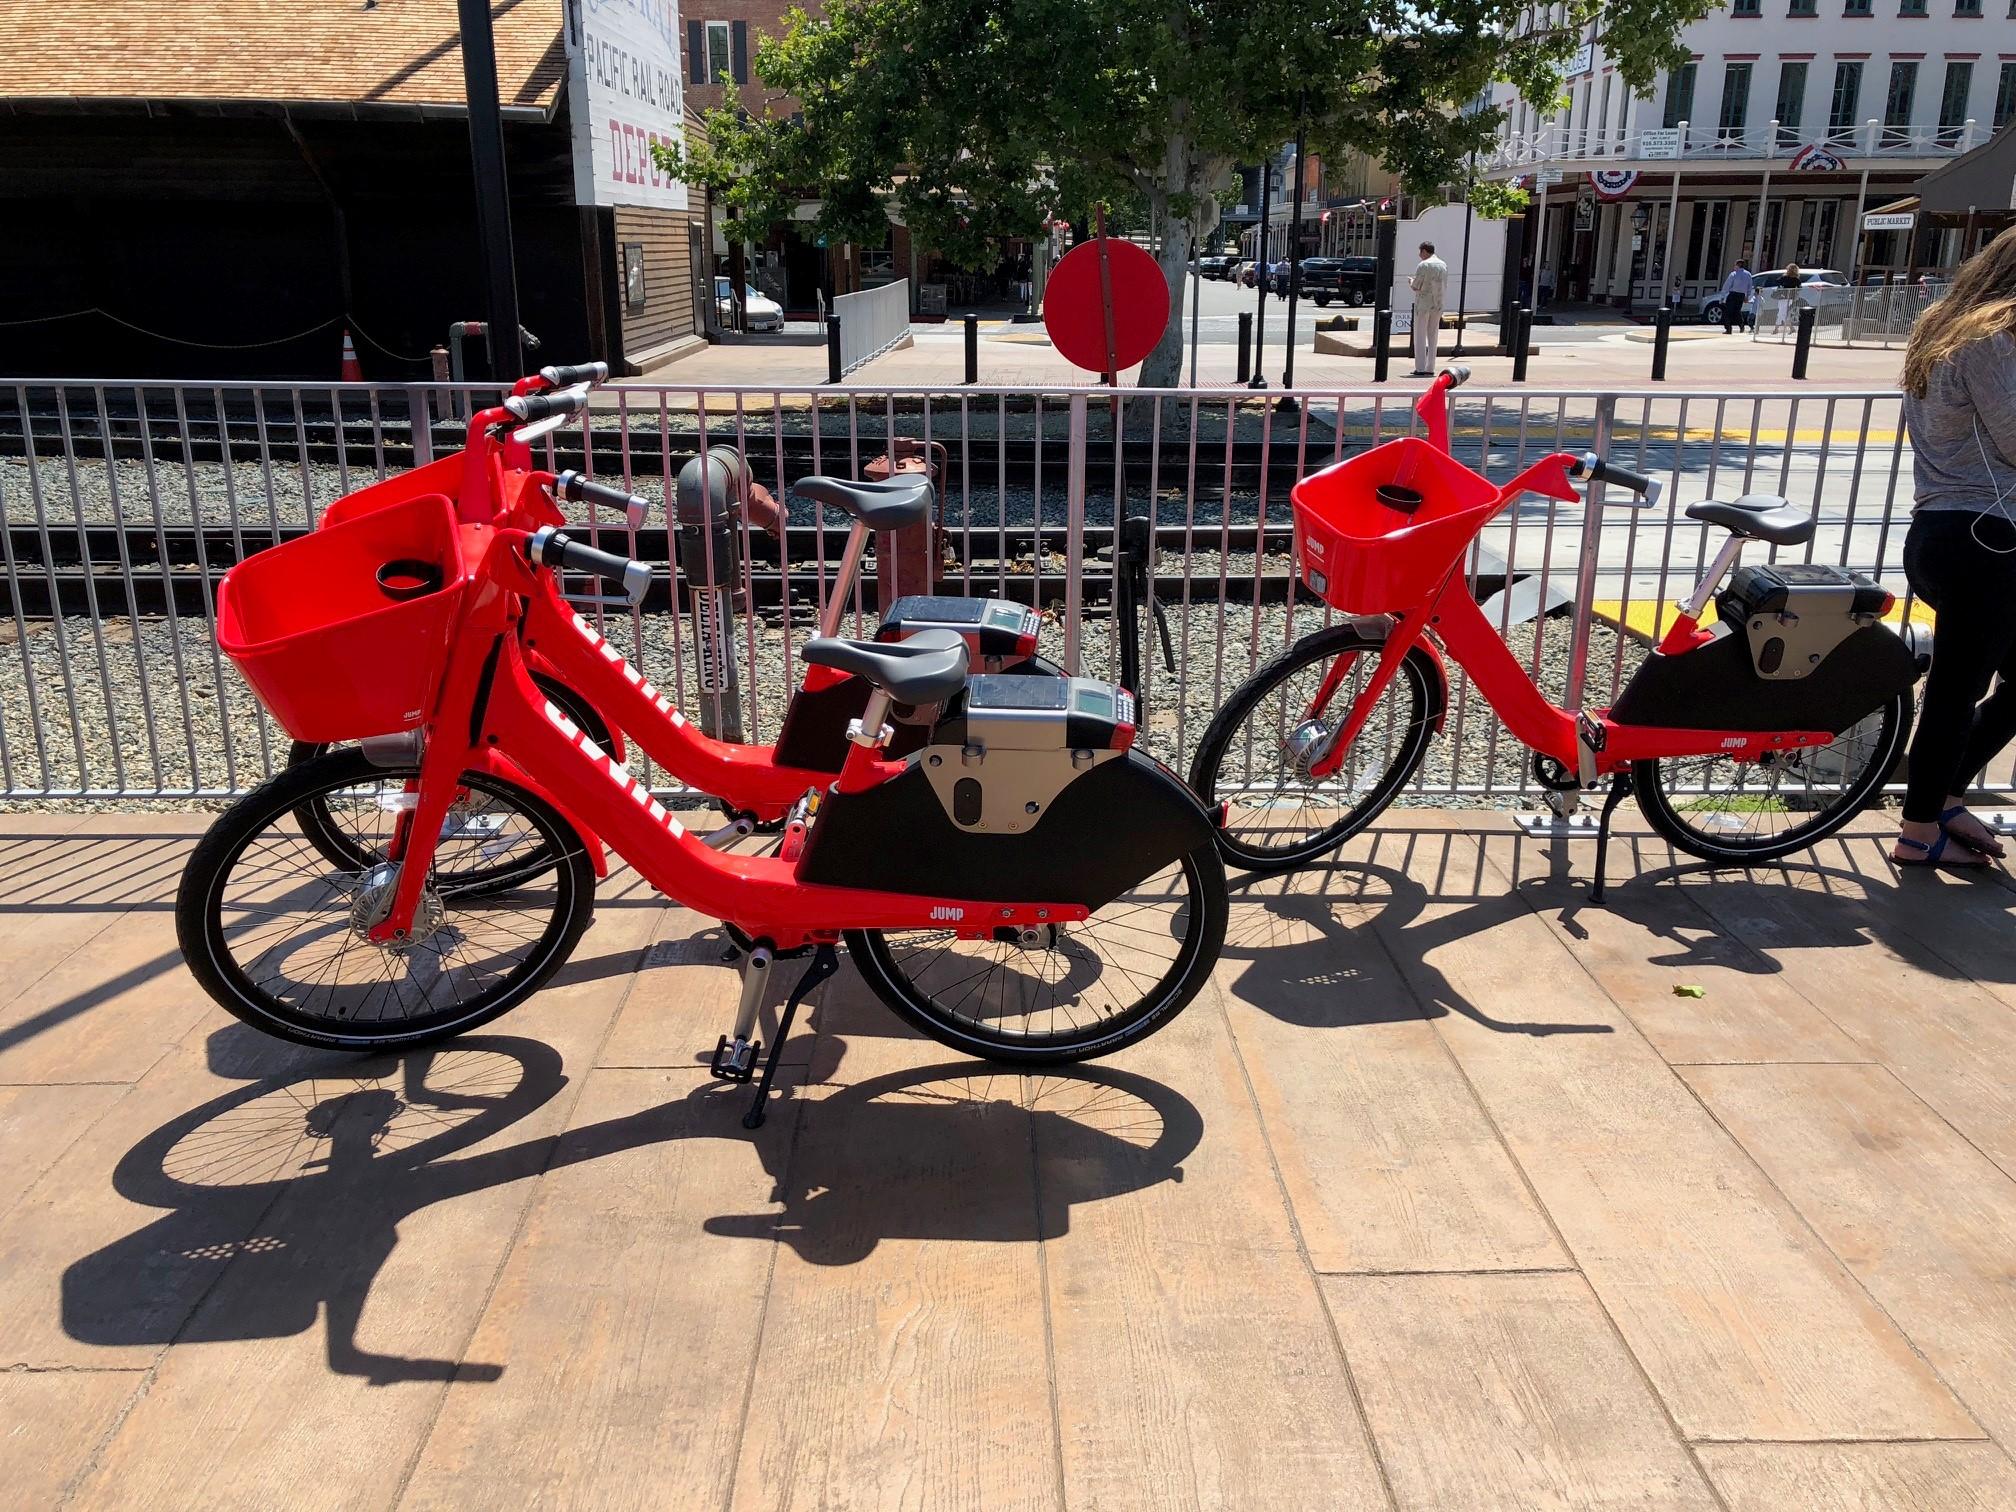 JUMP Bikes in Old Sacramento